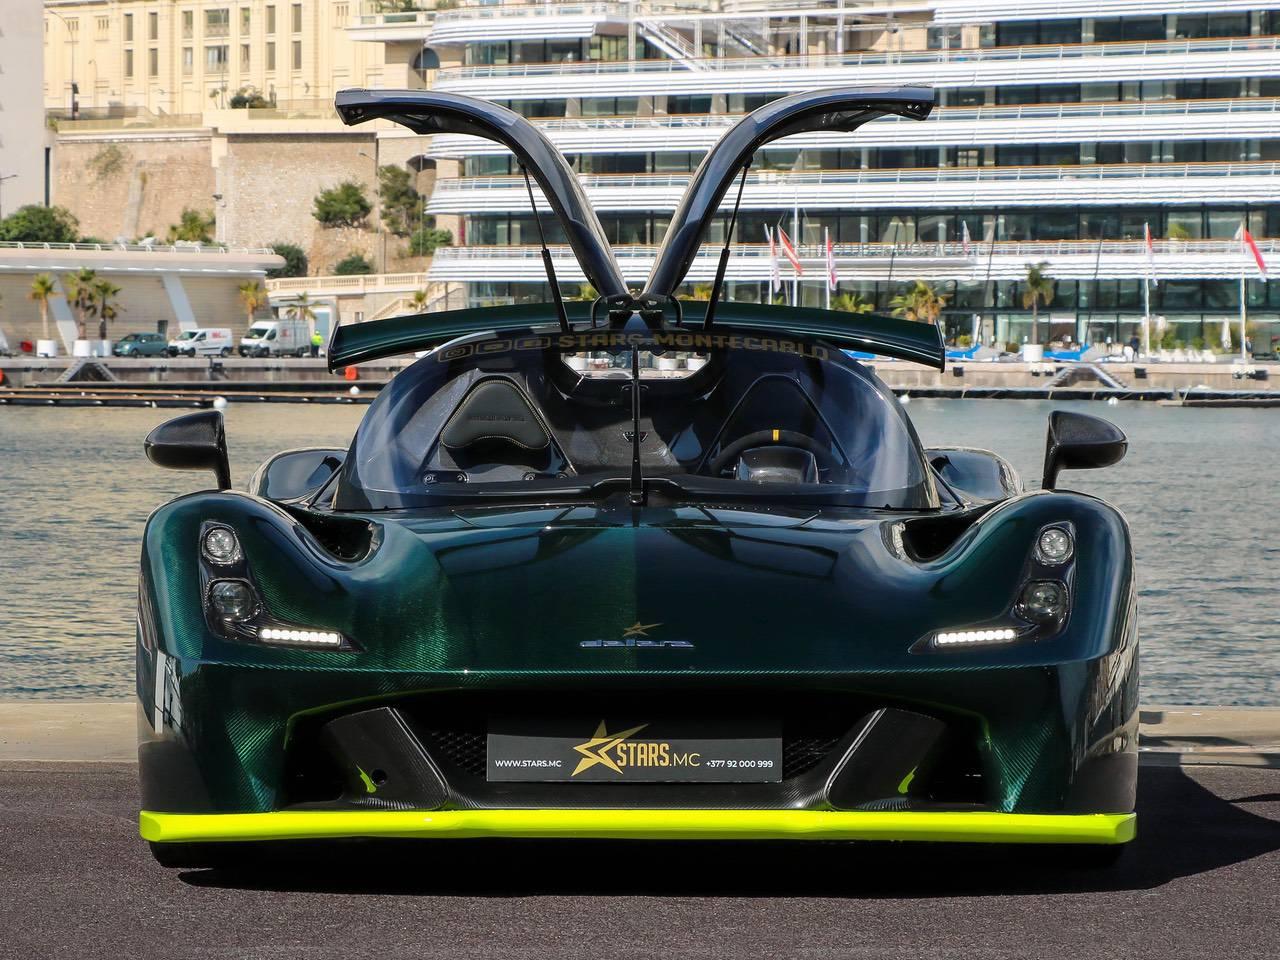 Dallara-Stradale-Convertible-Carbon-11